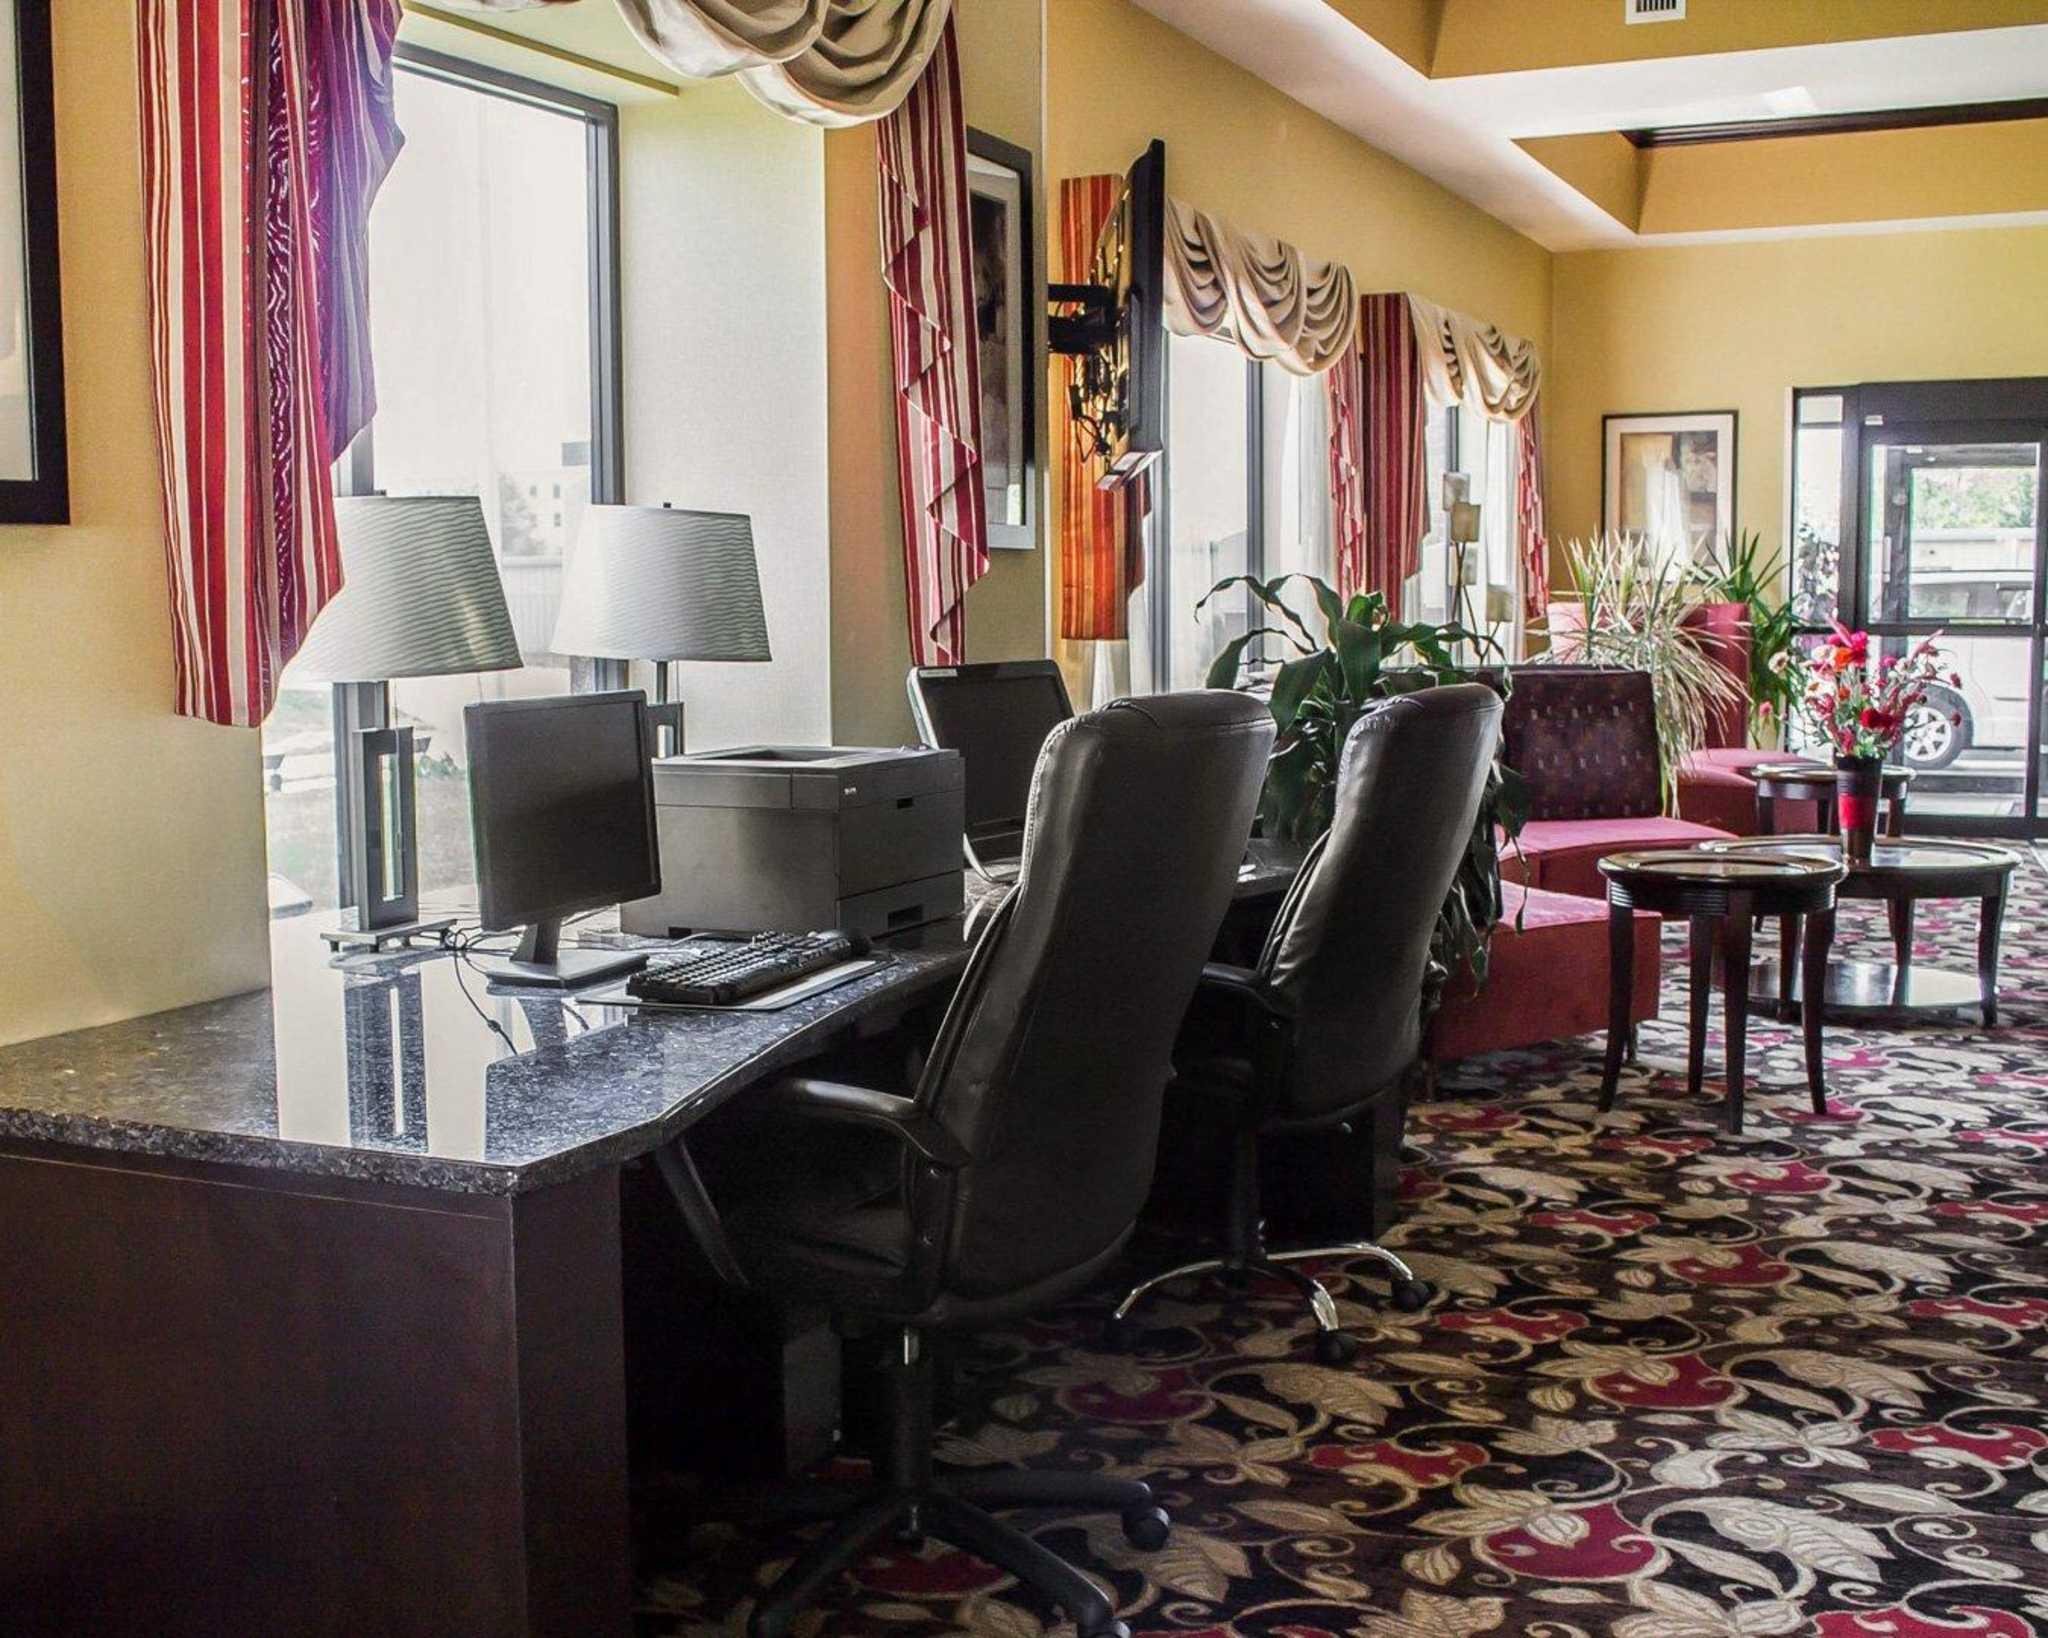 Comfort Suites East Broad at 270 image 55